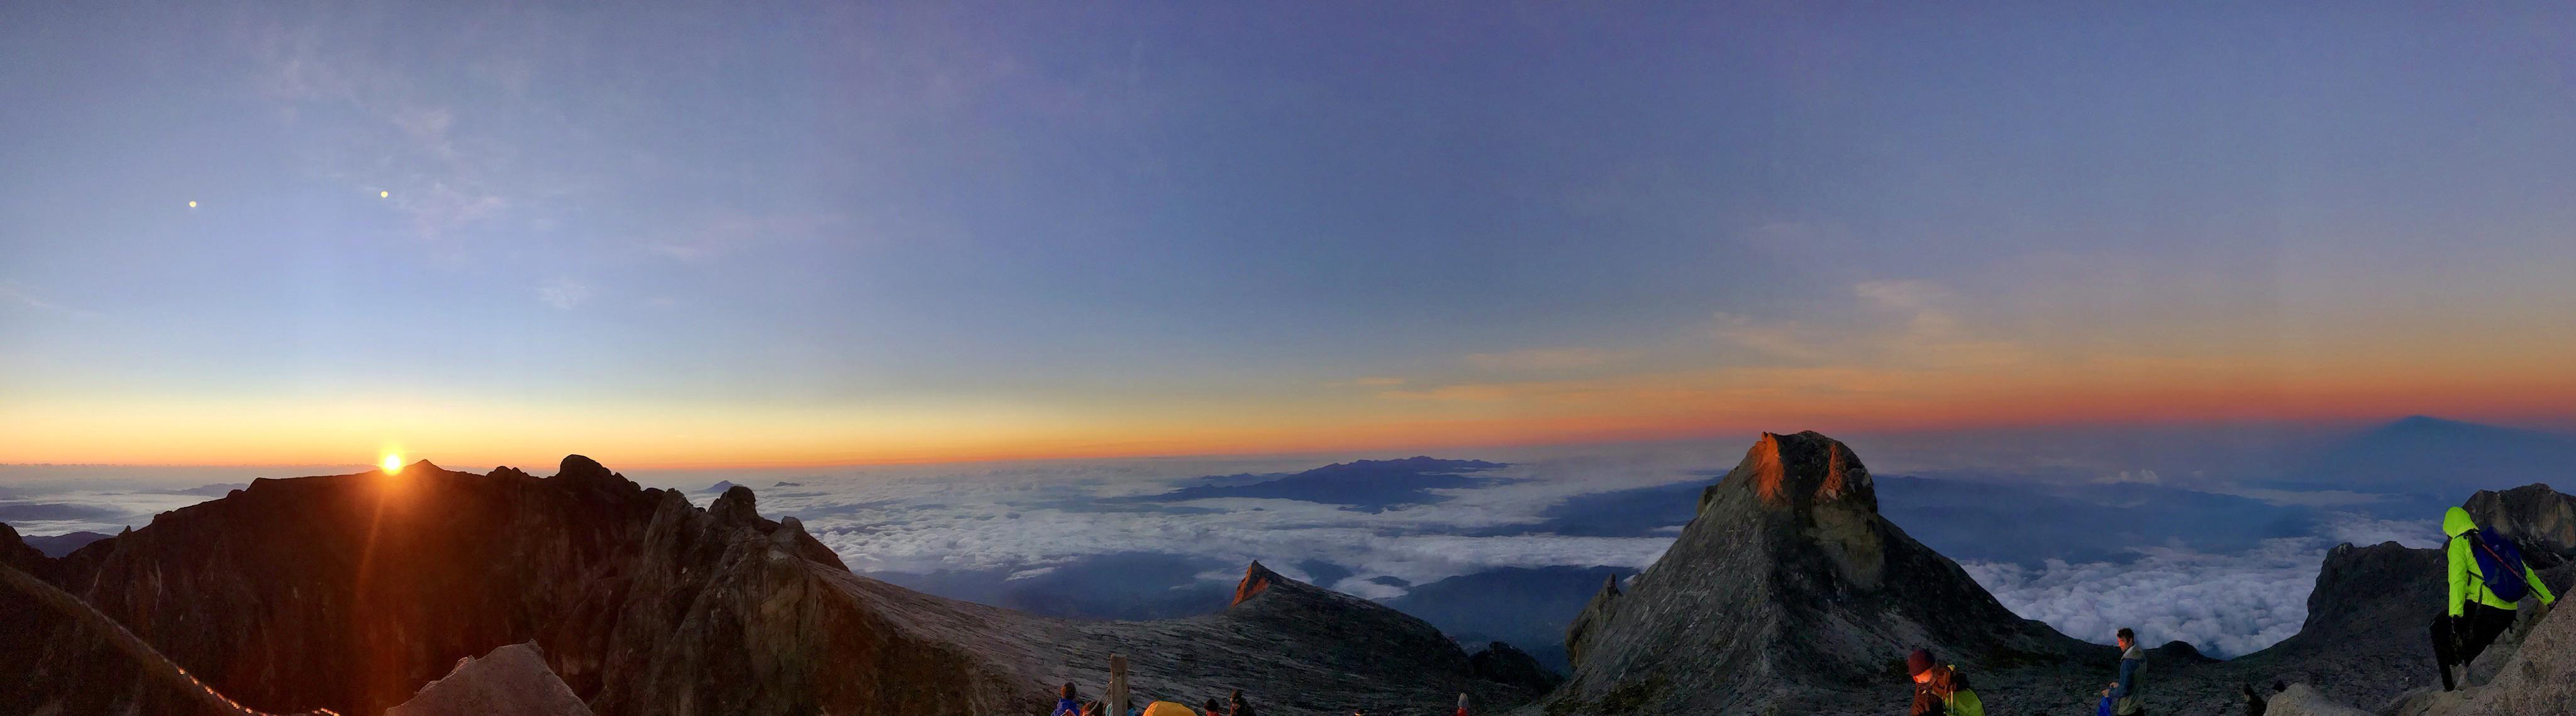 Sunrise at 4095.2m Mount Kinabalu Sabah Malaysia Camping